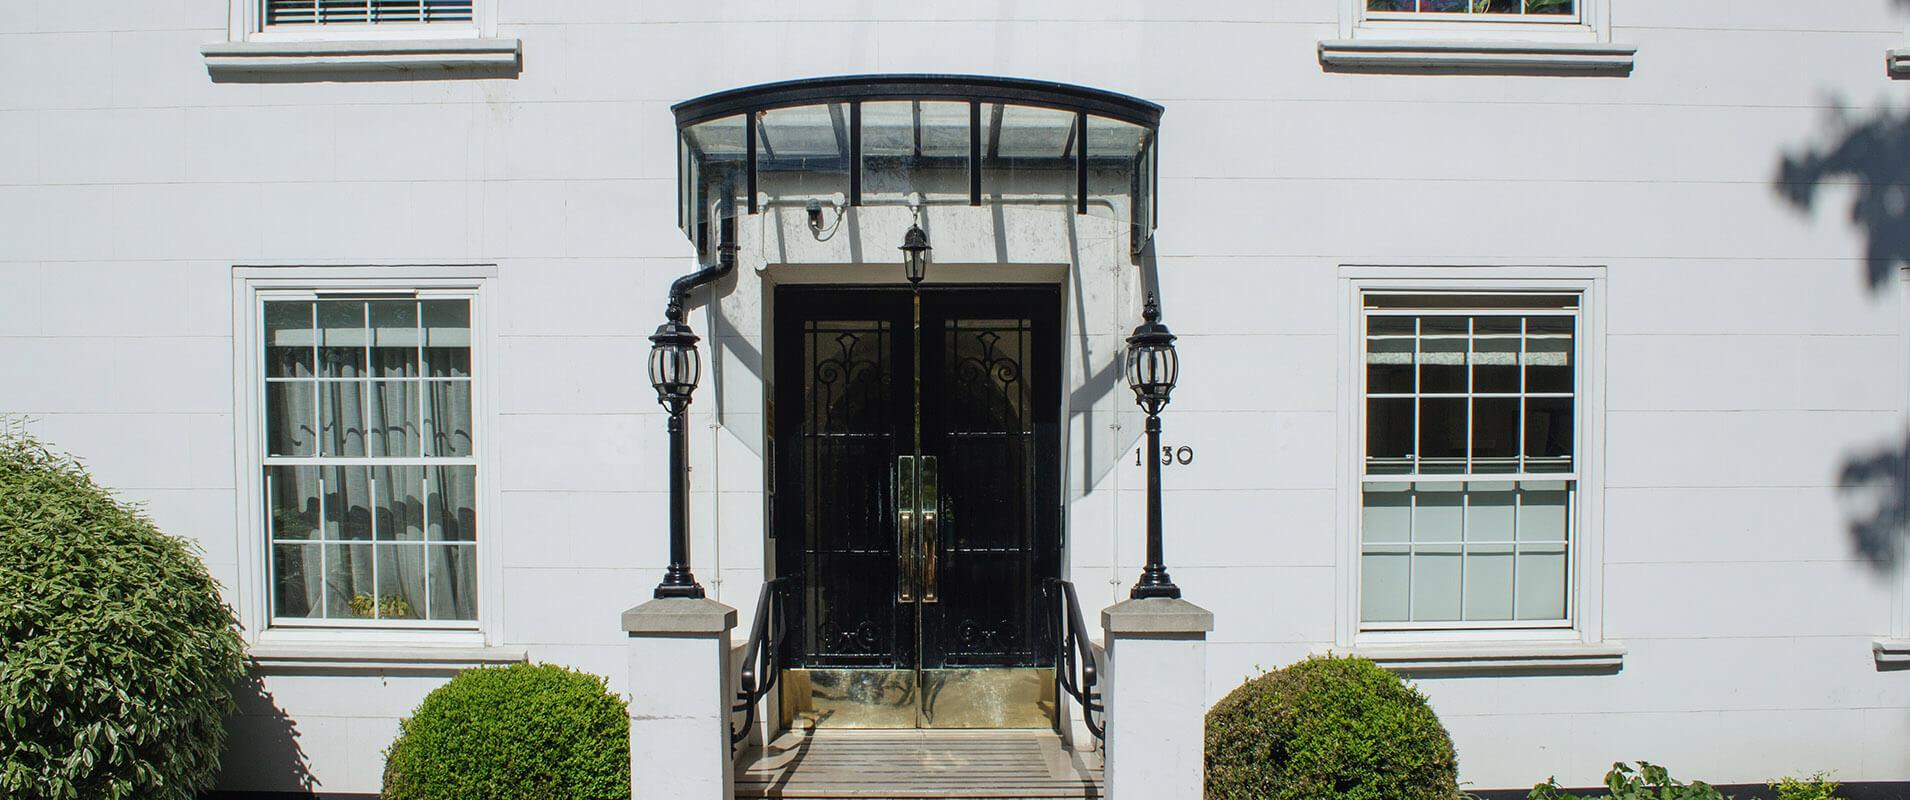 residential interior design in Kensington, London